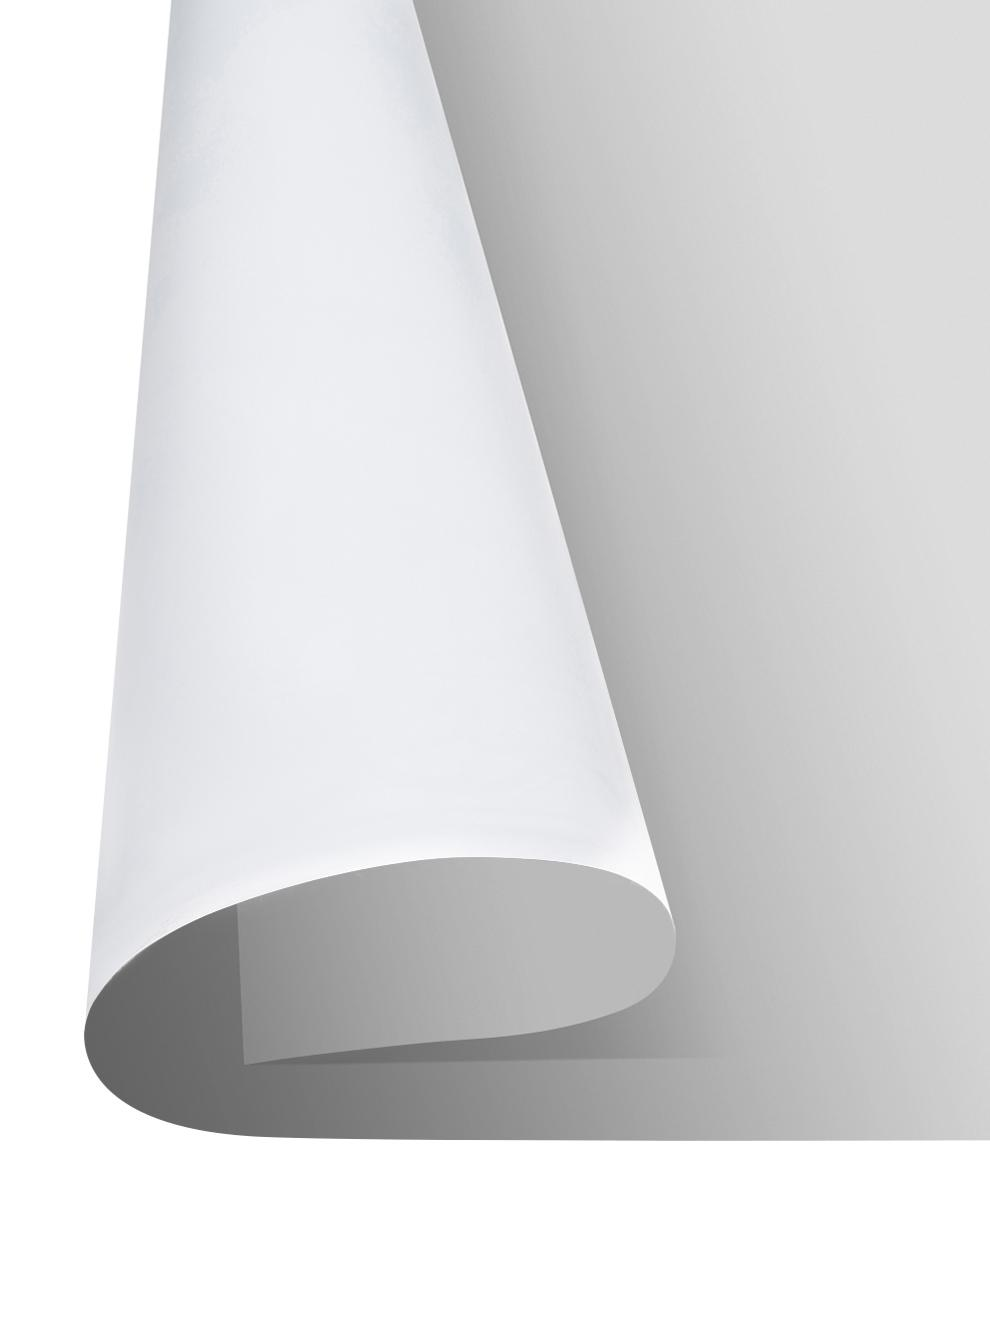 Vinyl-Bodenmatte Elena, Vinyl, recycelbar, Schwarz, Weiß, Grau, 65 x 255 cm